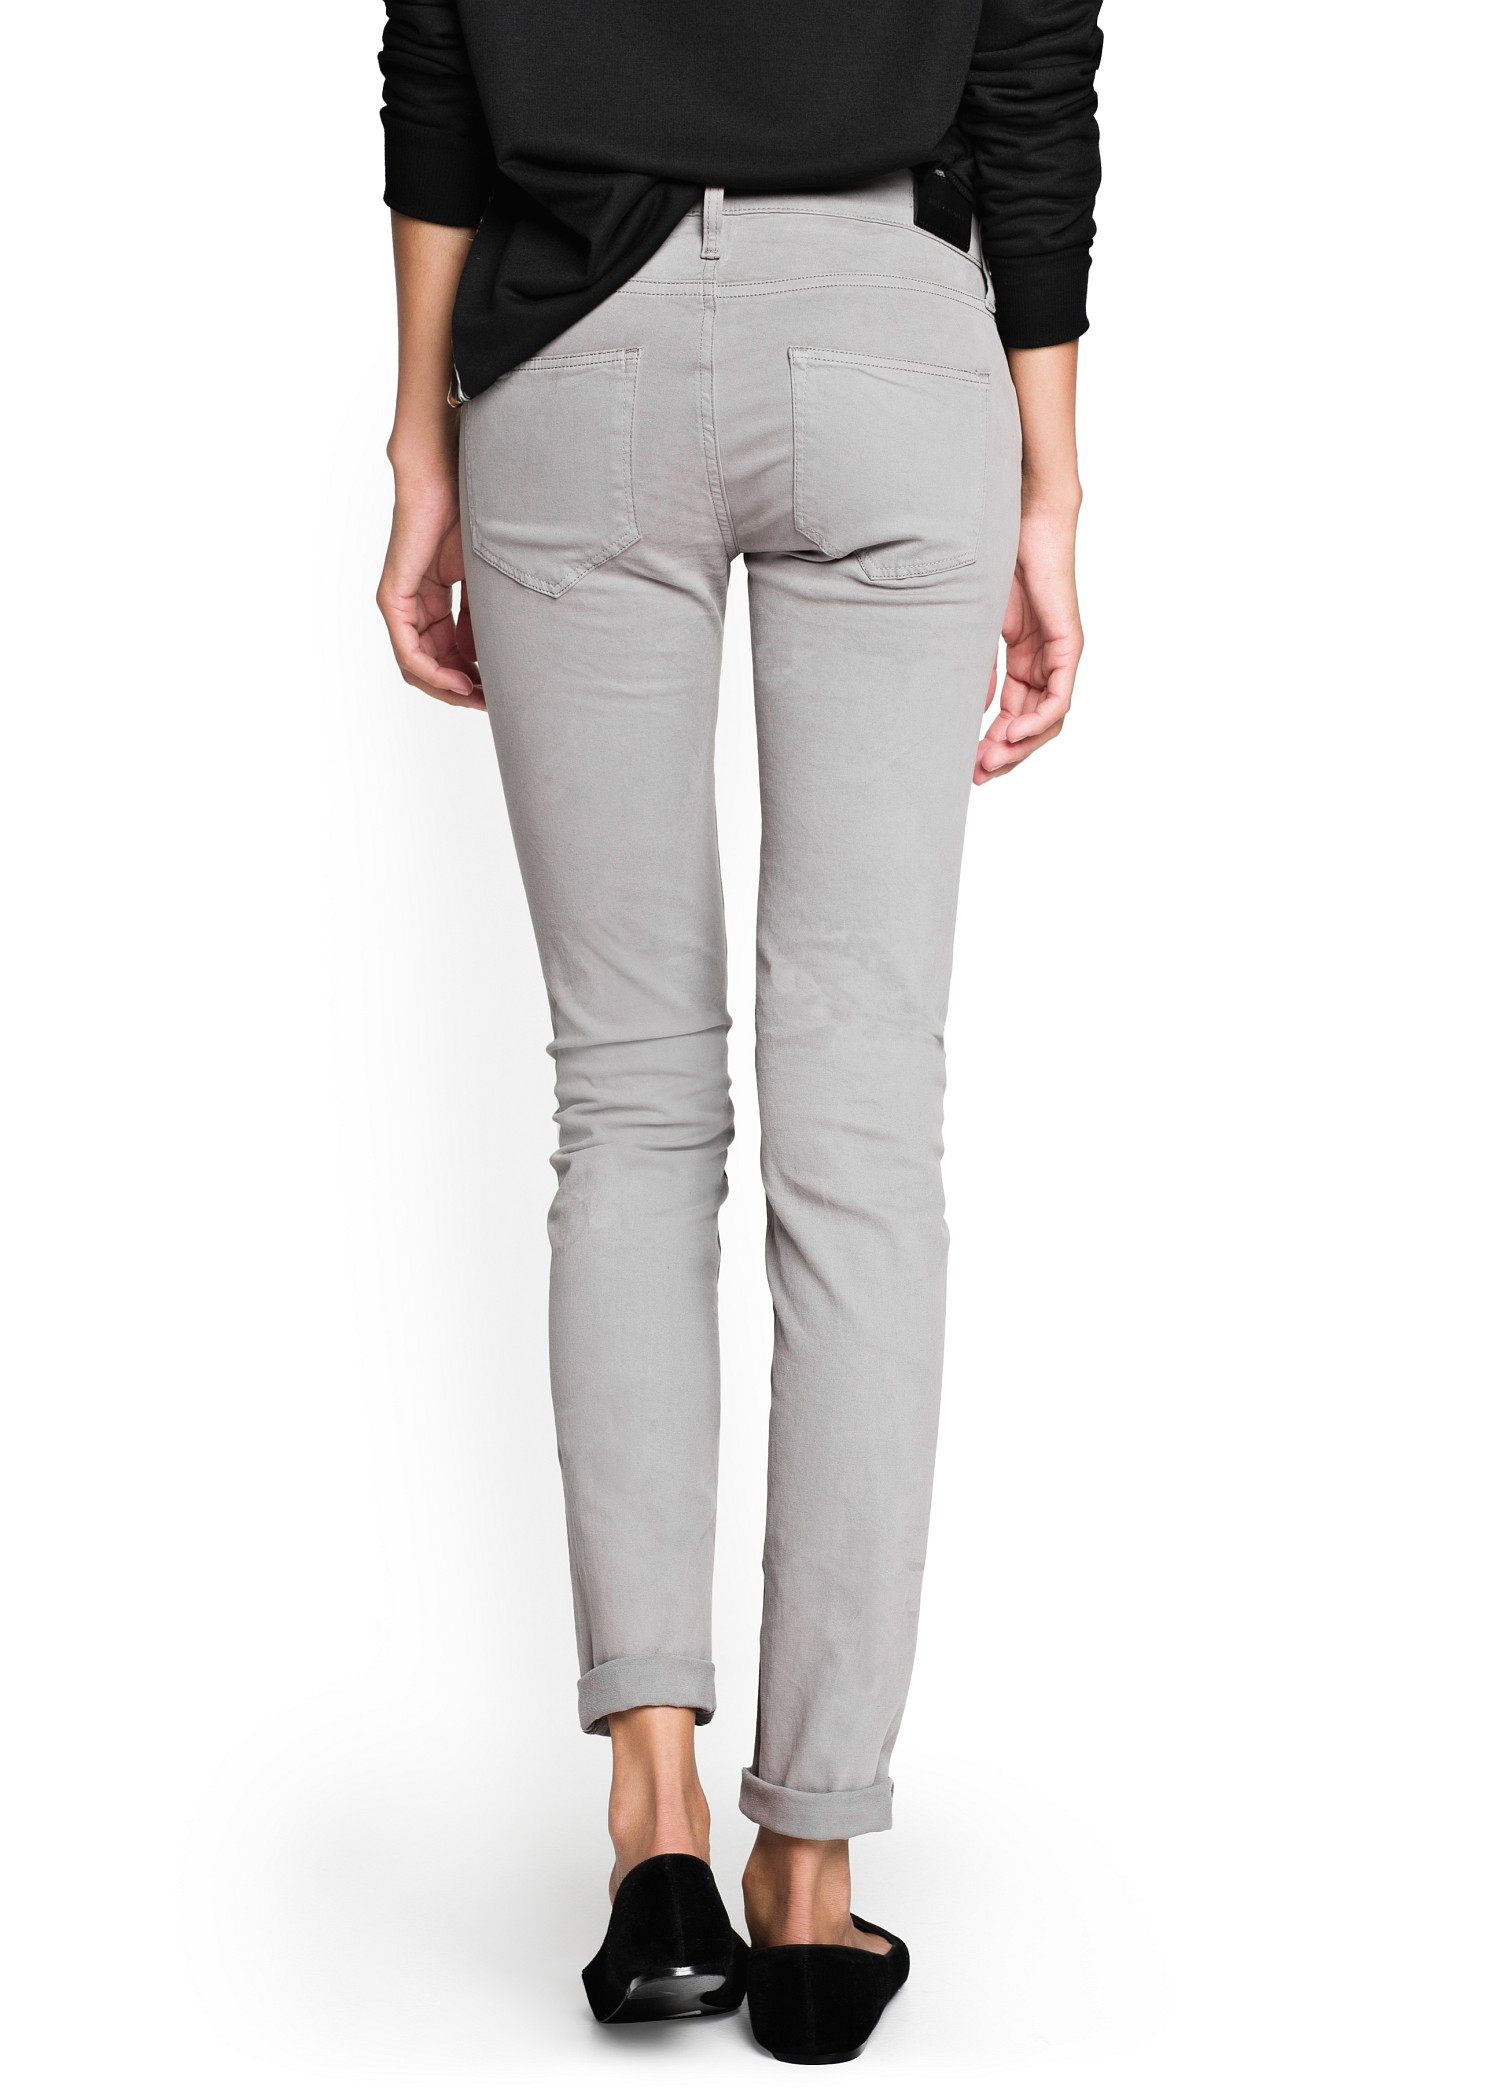 Super skinny fit women's jeans